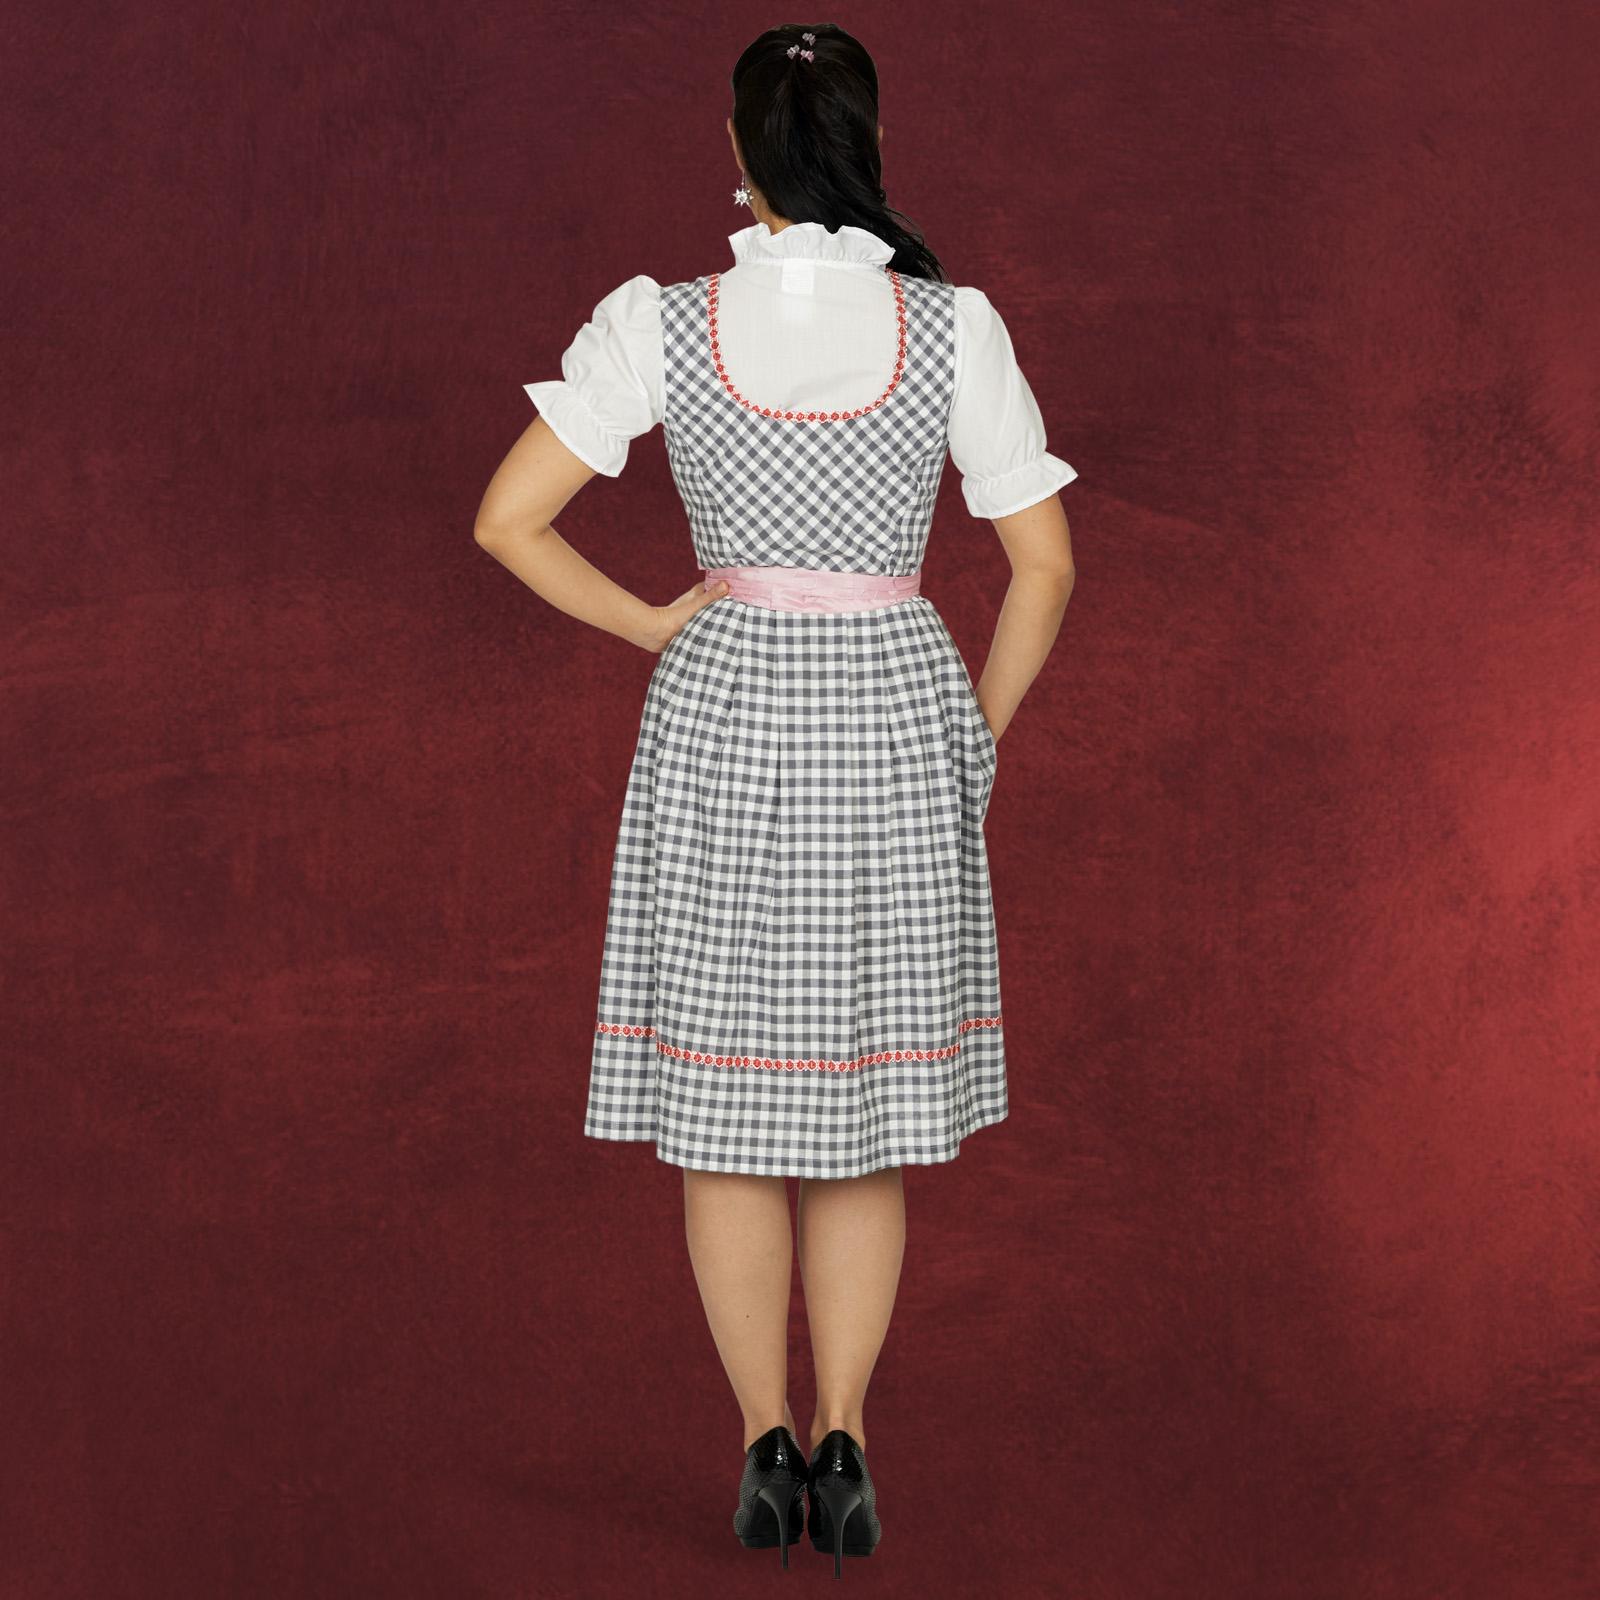 dirndl oktoberfest damen tracht kleid rosa knielang bluse wiesn edelwei kn pfe ebay. Black Bedroom Furniture Sets. Home Design Ideas